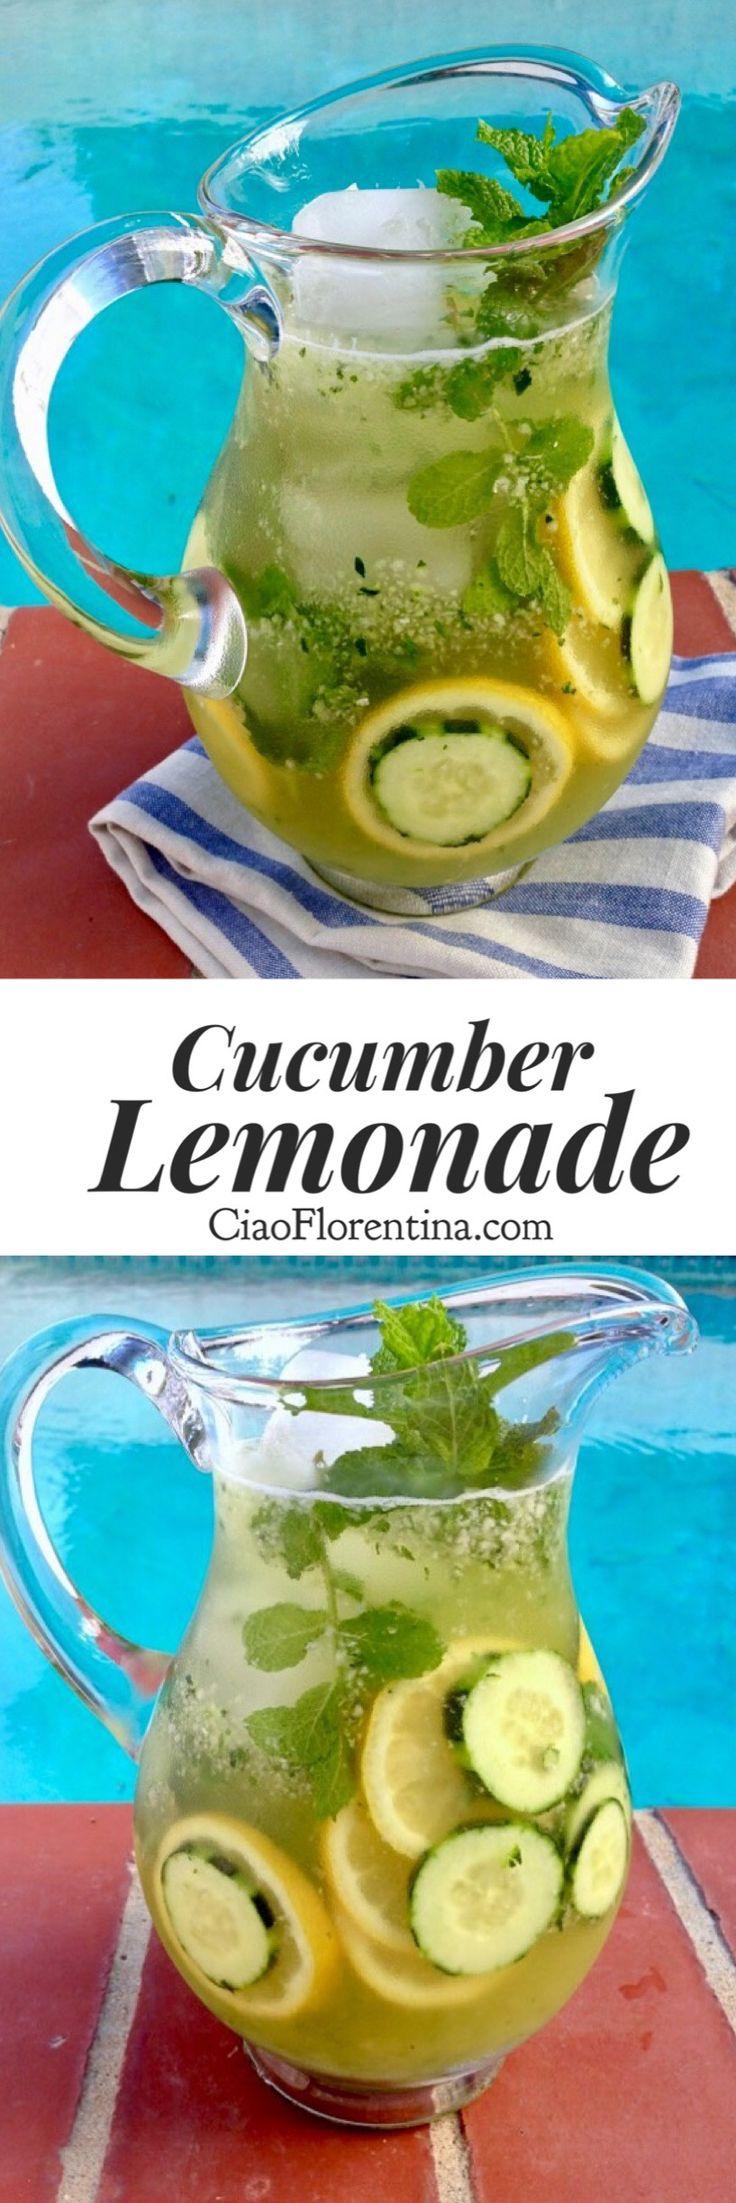 Cucumber Lemonade Recipe | CiaoFlorentina.com @CiaoFlorentina minus The Vodka for me.